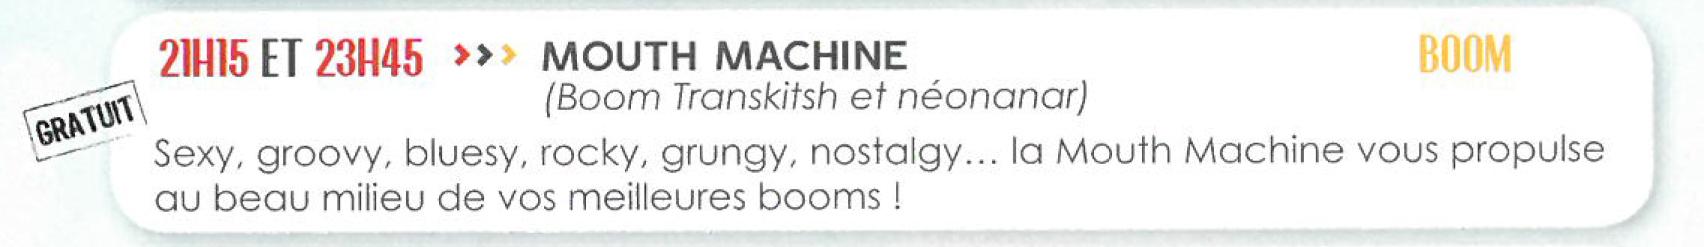 mouthmachine